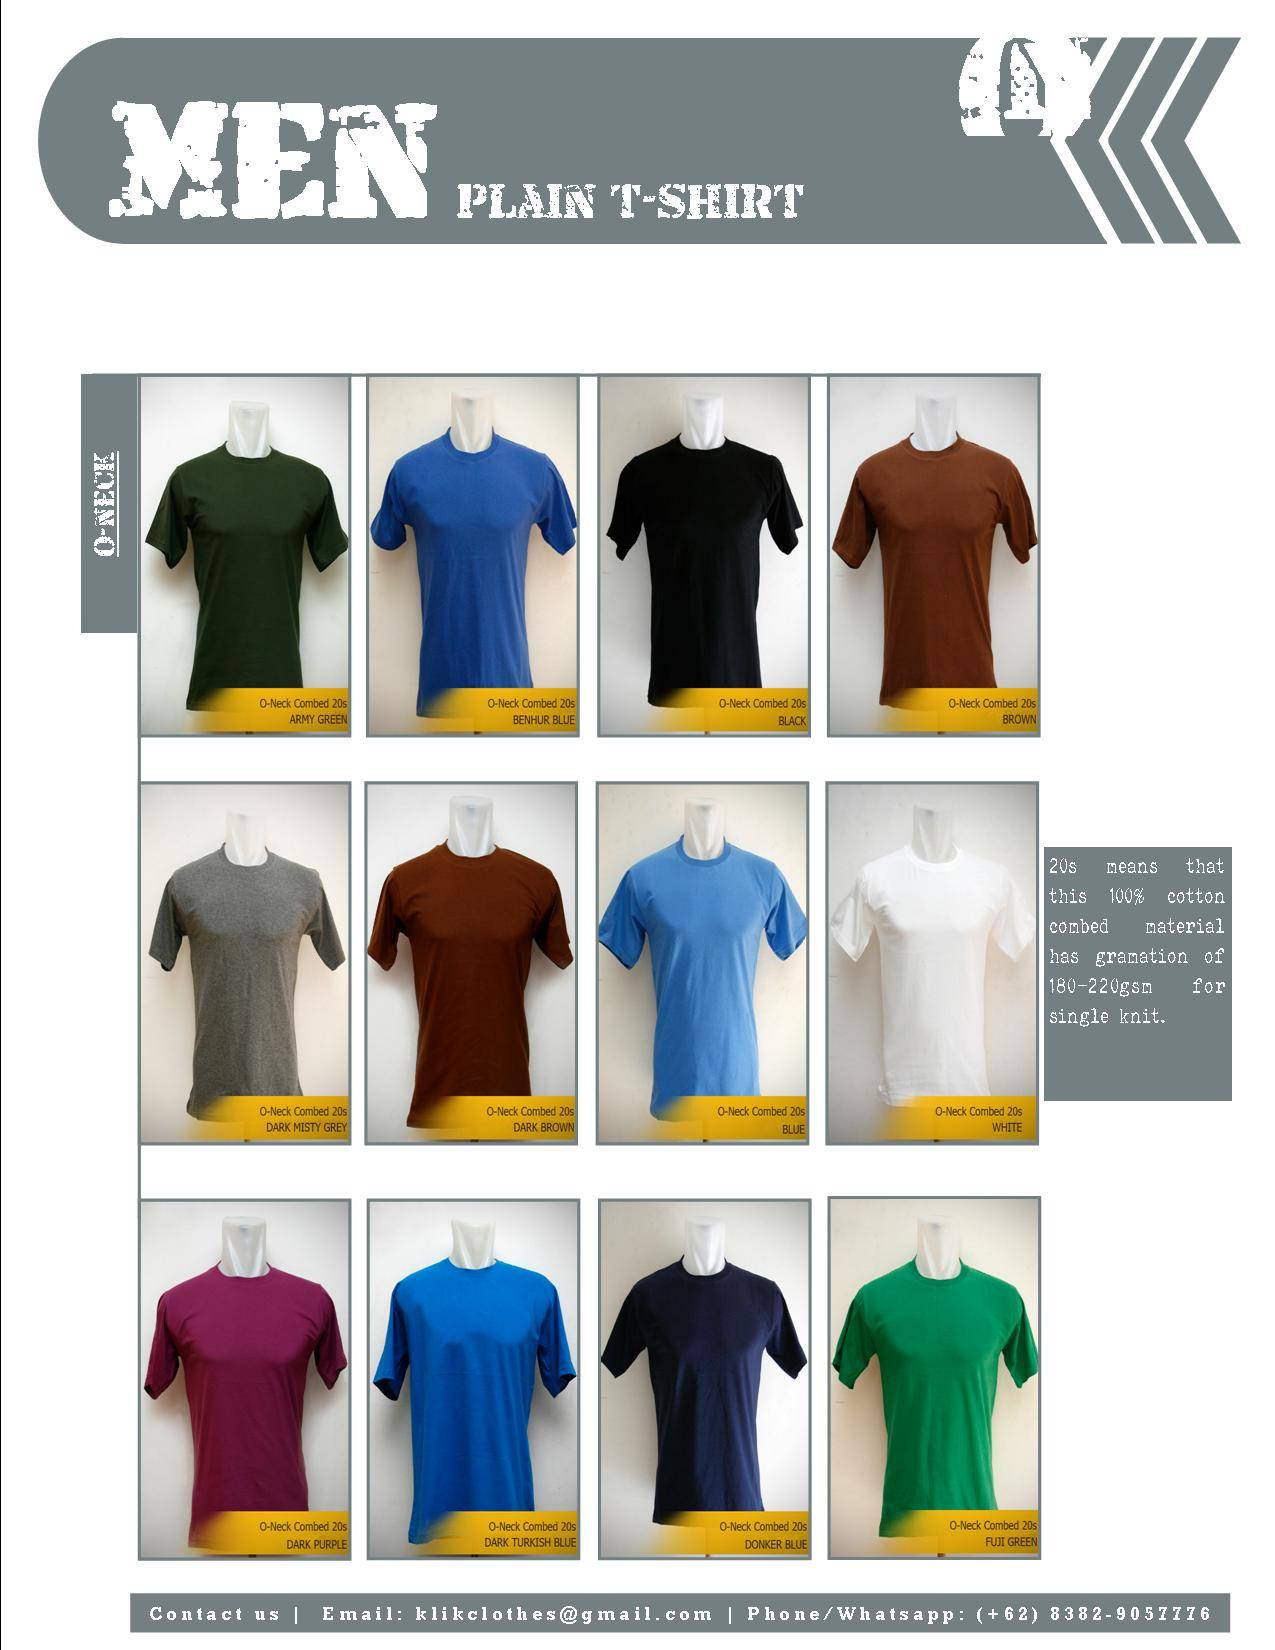 High Quality Plain T-Shirt